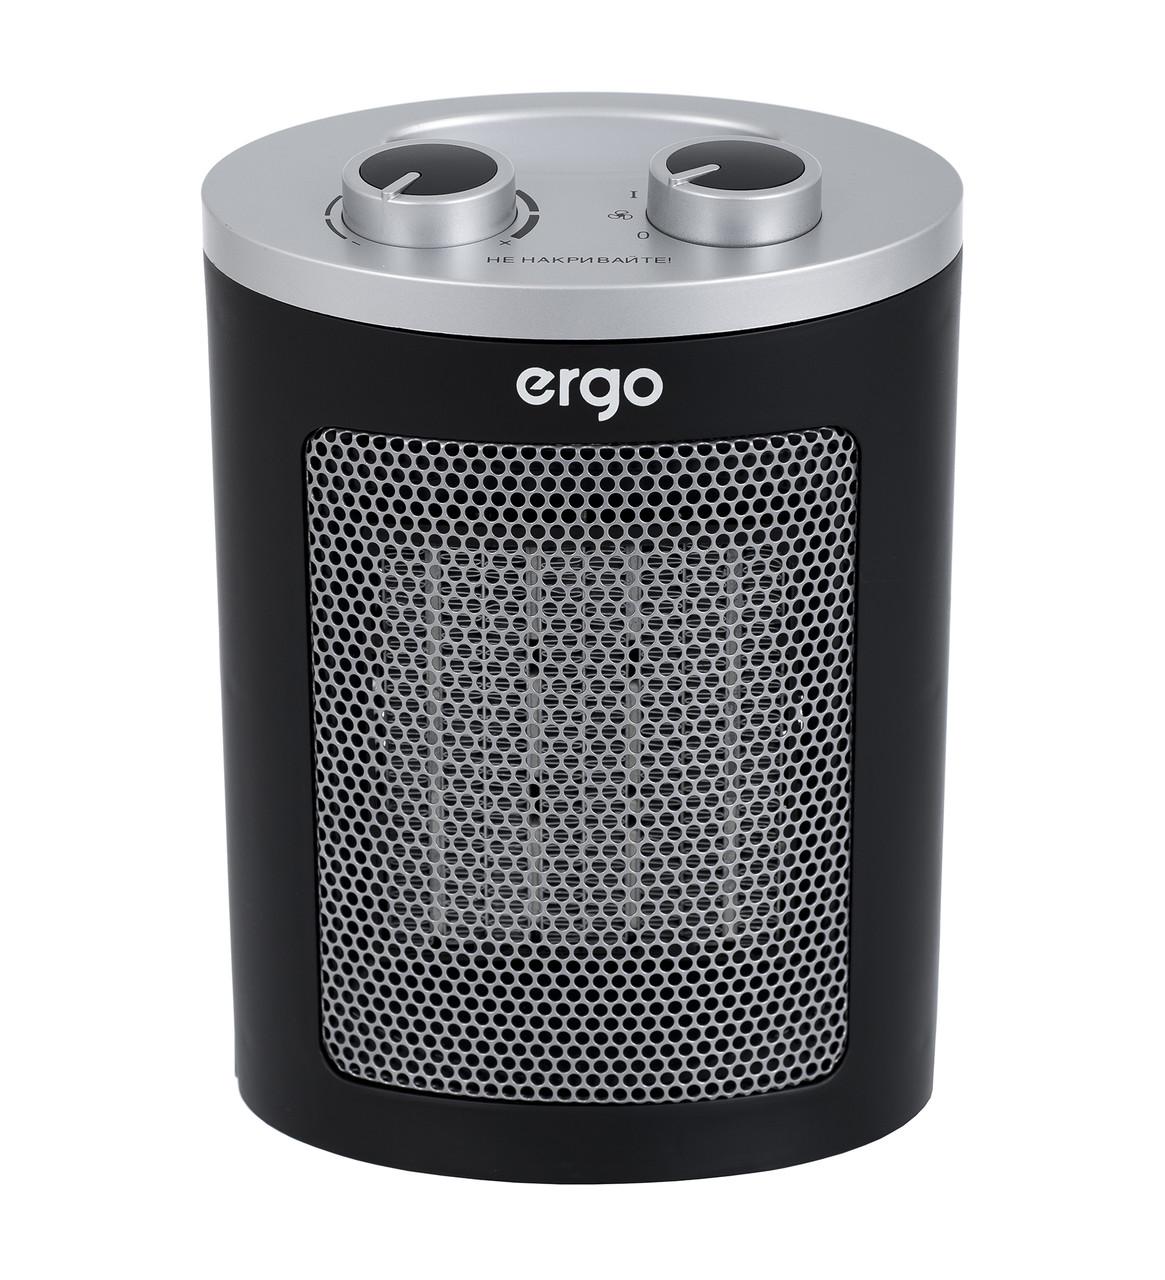 Тепловентилятор Ergo FHC 2015